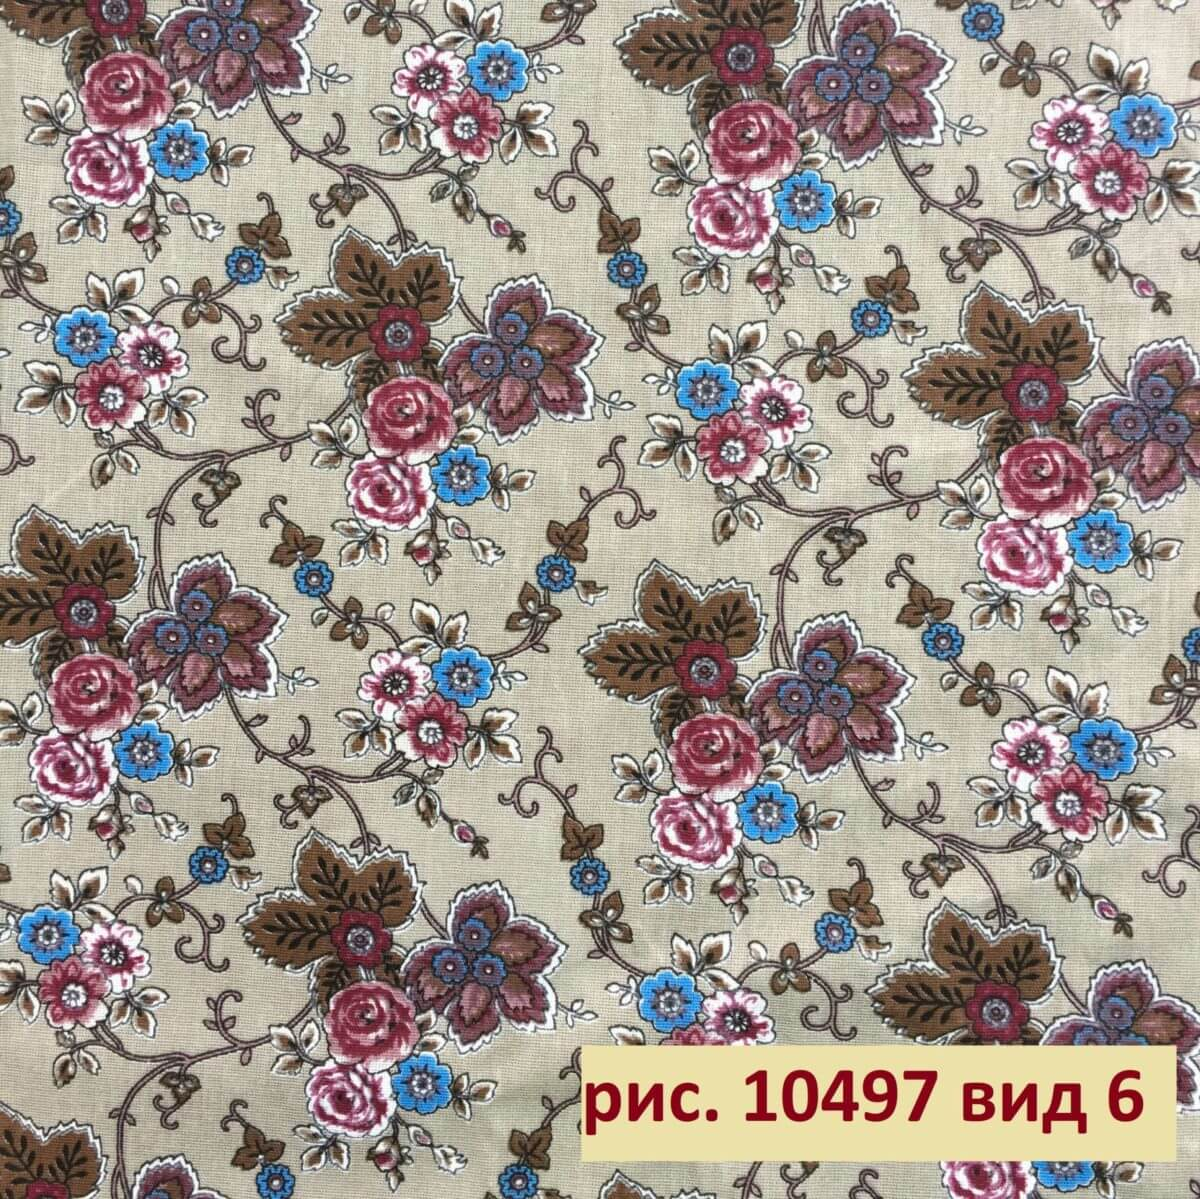 Фото 16 - Плательная ткань бязь 150 см (10497/3) Под заказ.